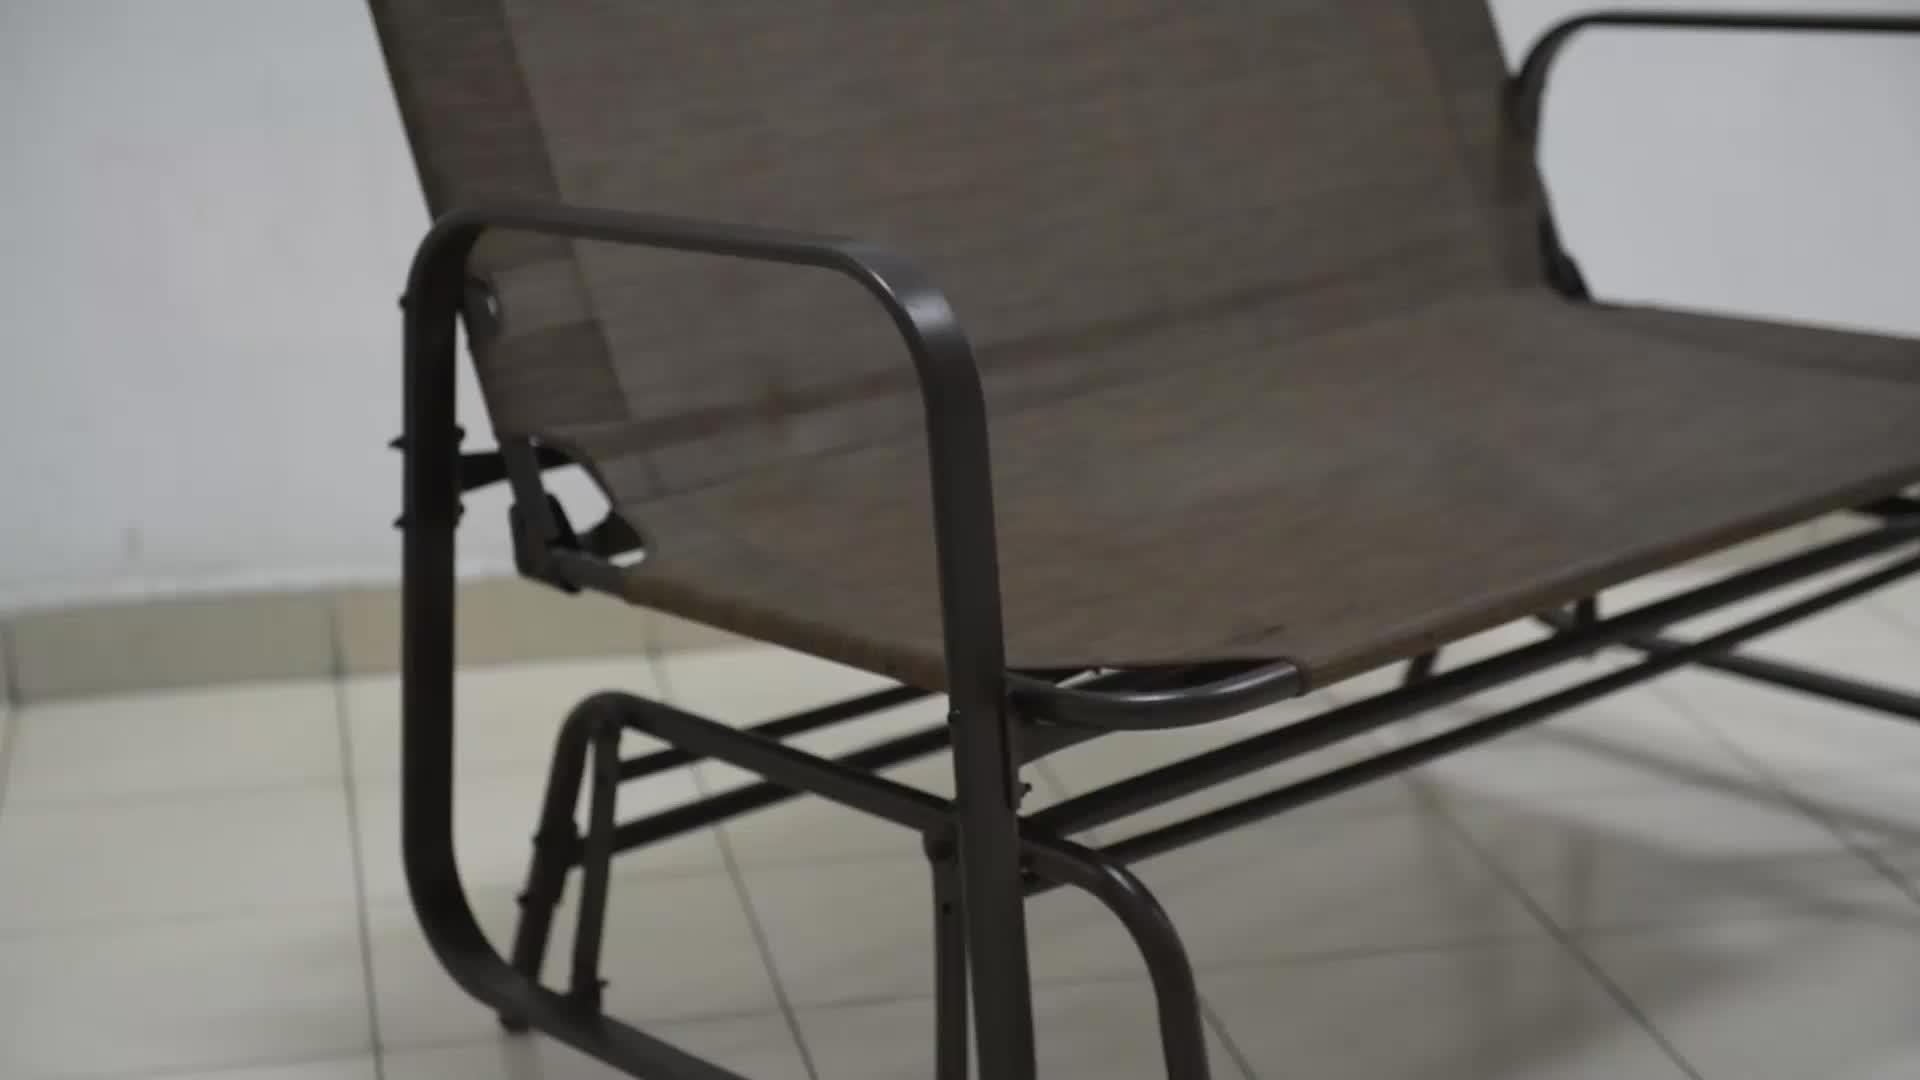 Outdoor Garden Steel Frame Patio Swing Glider Loveseat Bench Rocking Chair – Buy Outdoor Garden Bench,metal Garden Bench,glider Rocking Chair Product Throughout Steel Patio Swing Glider Benches (View 2 of 25)